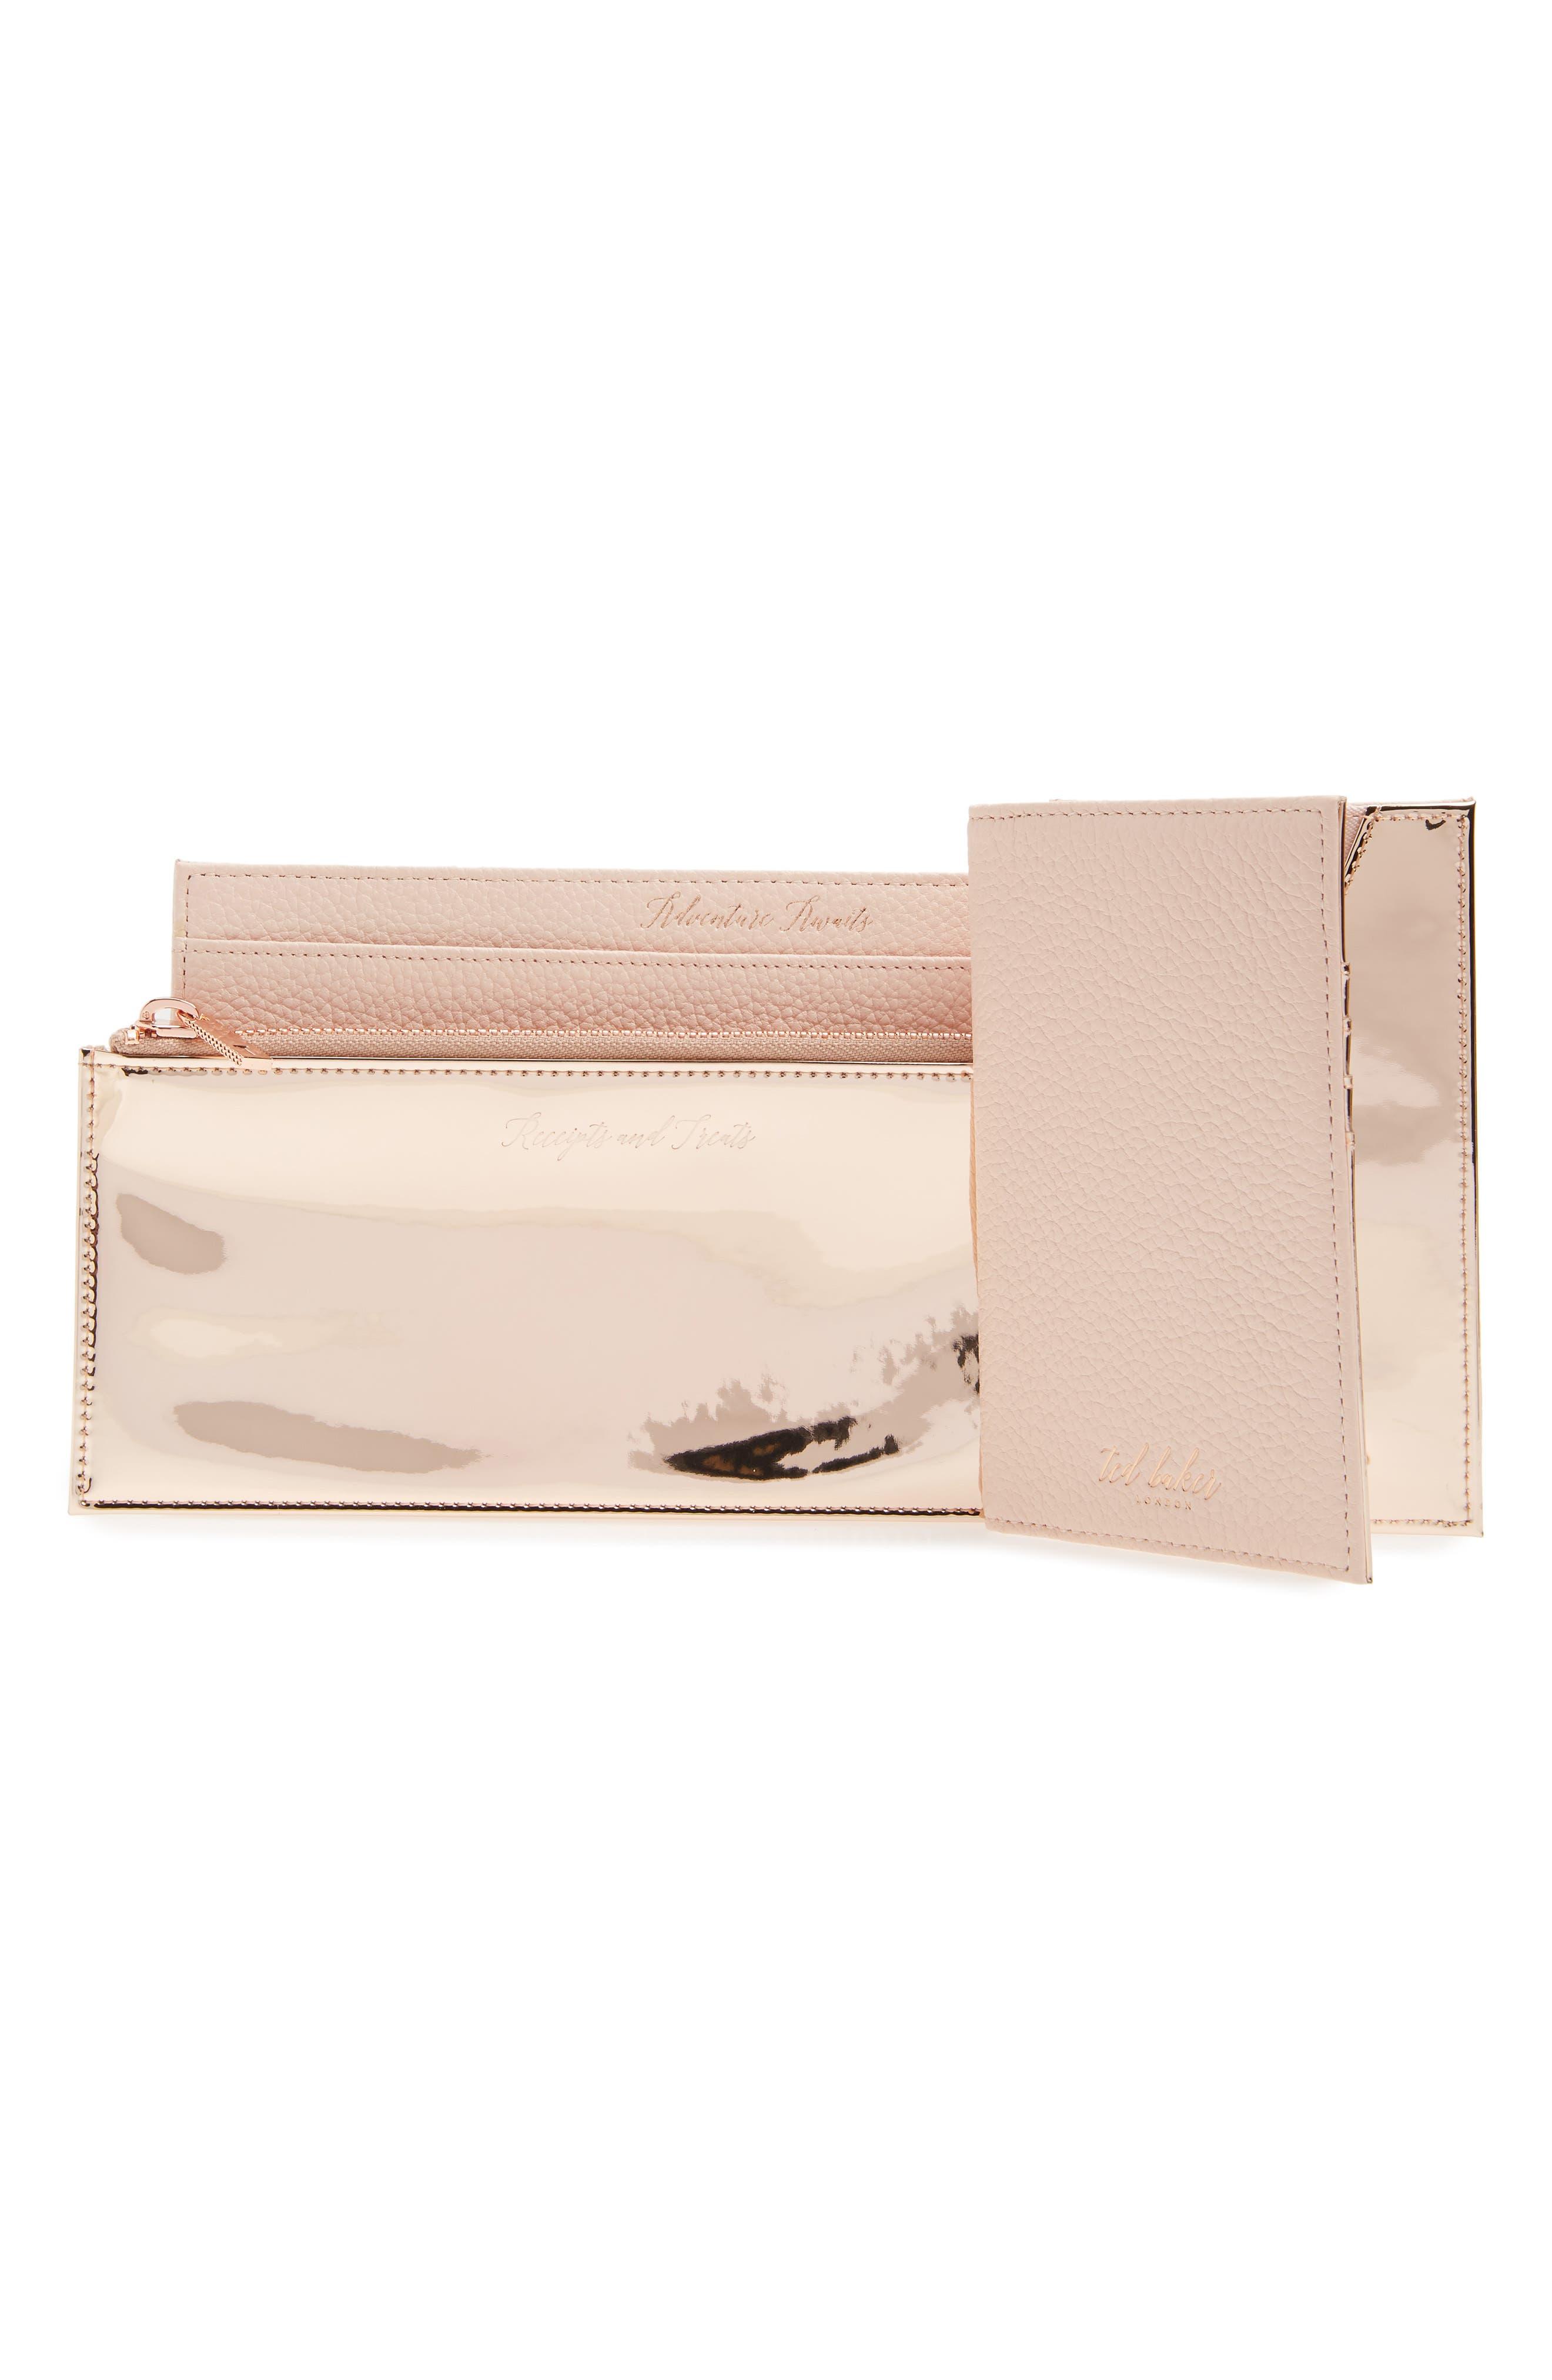 Kayy Metallic Leather Travel Wallet,                             Alternate thumbnail 6, color,